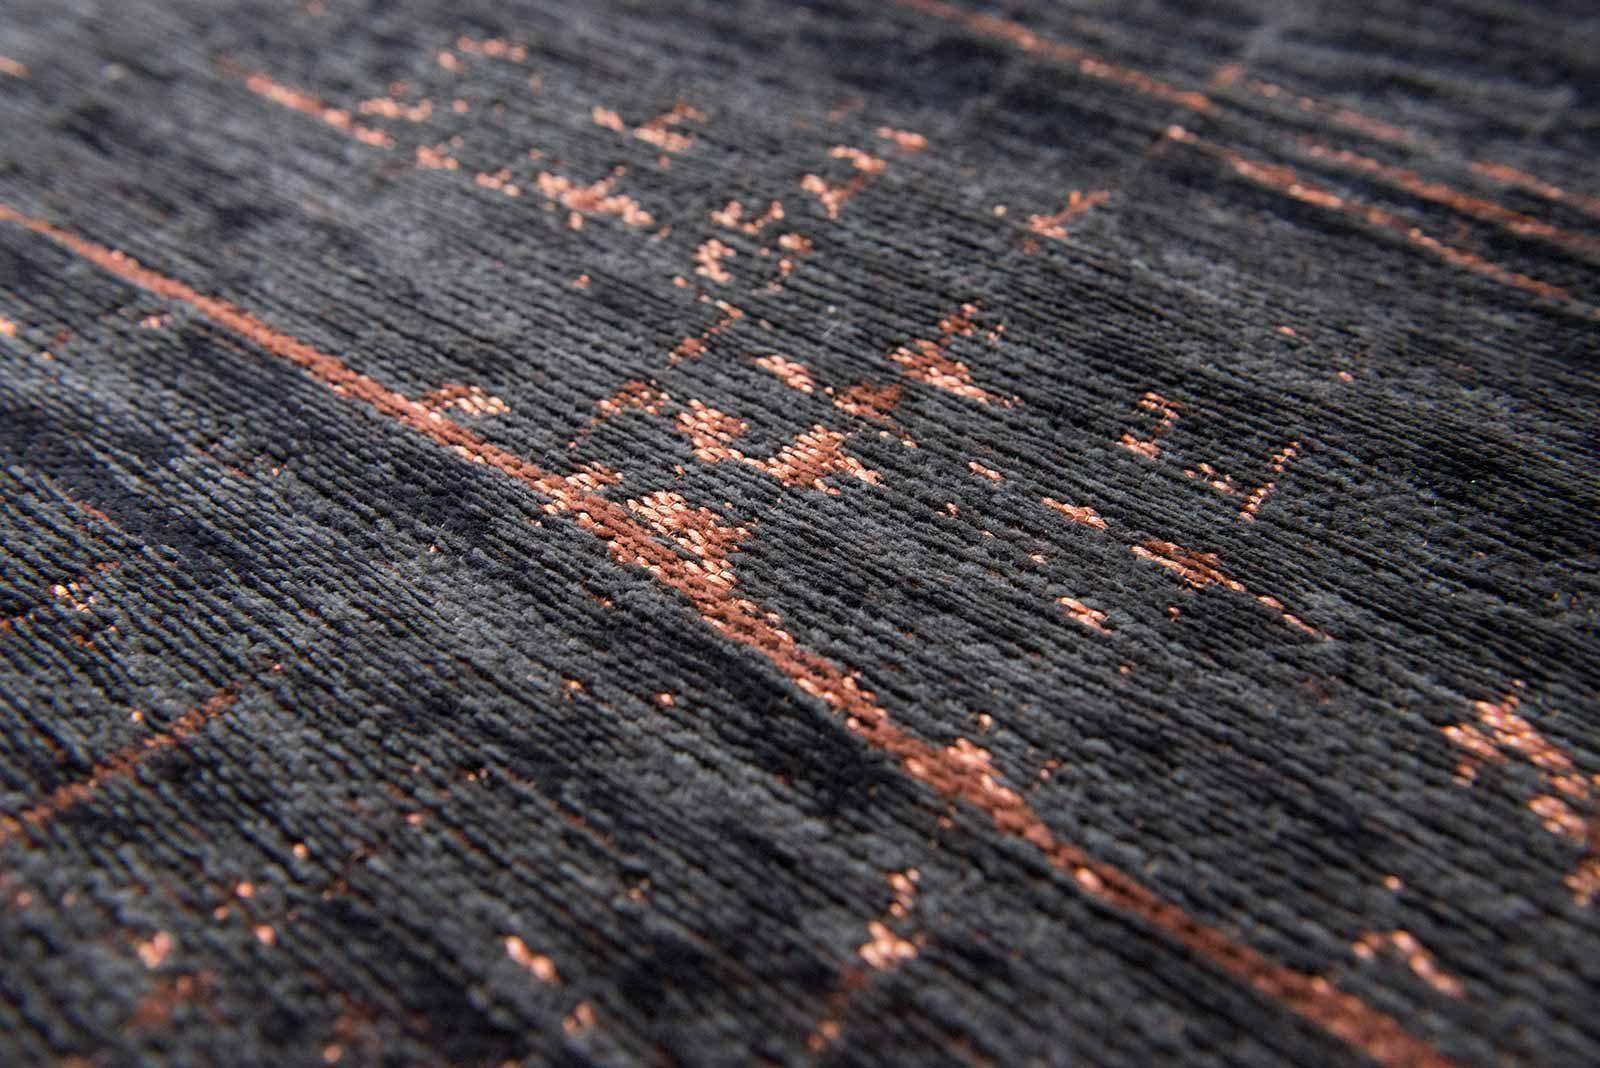 alfombras Louis De Poortere LX8925 Mad Men Griff Soho Copper zoom